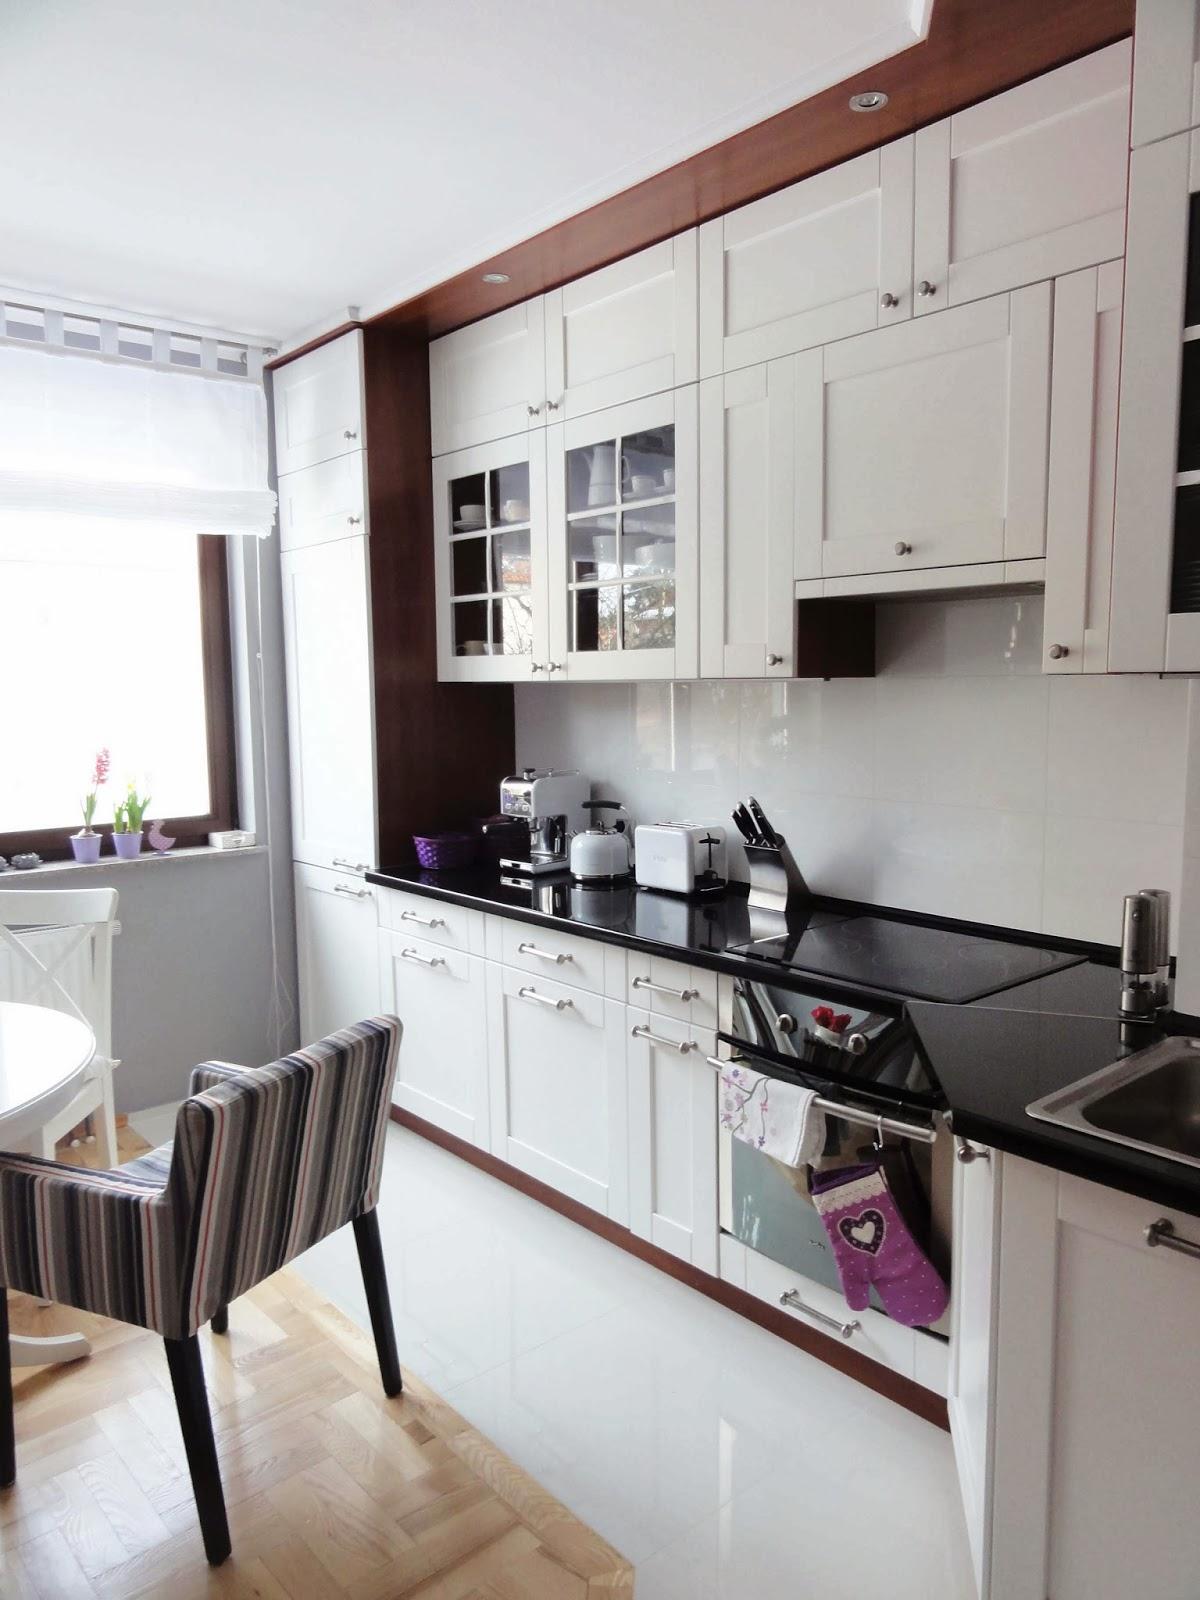 dekorator amator Biała kuchnia  -> Castorama Kuchnia City Biala